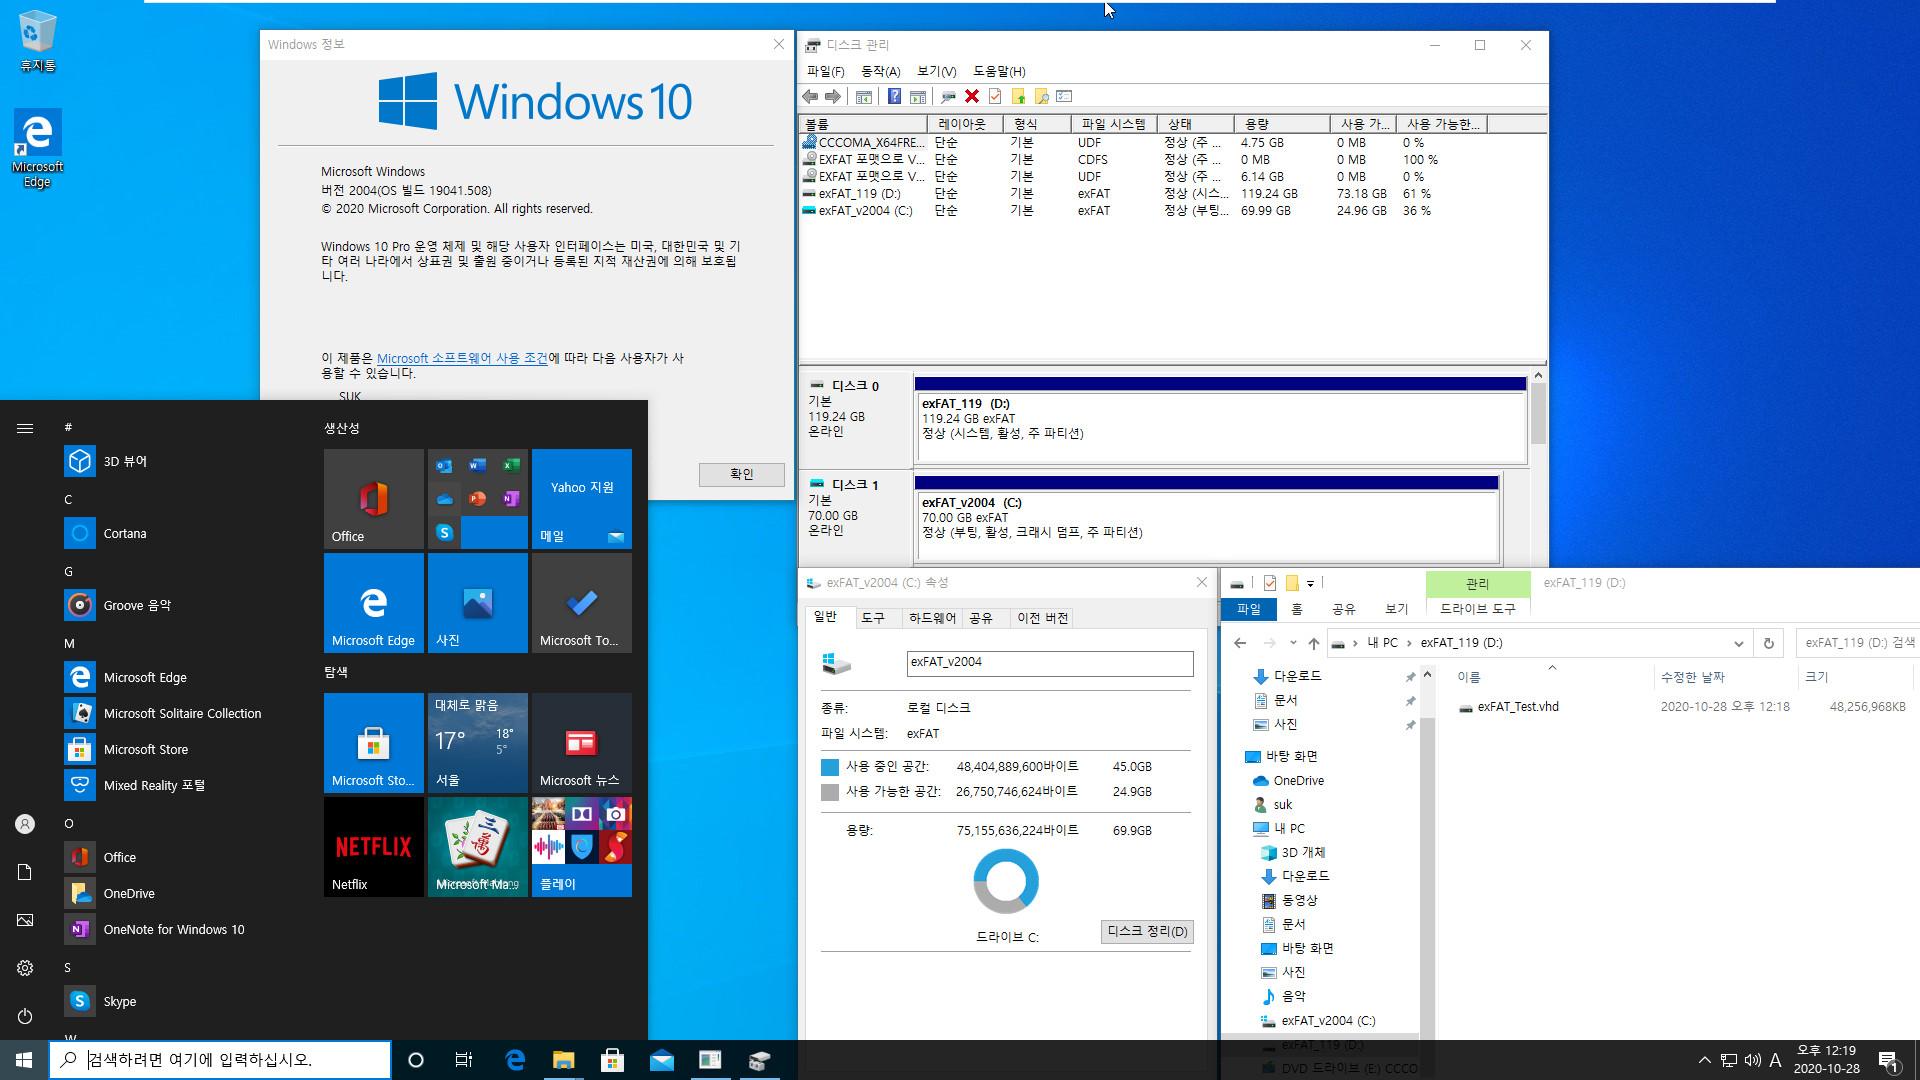 exFAT 포맷으로도 VHD 부팅이 Windows 10 버전 1903부터 된다고 하여 테스트 - 다시 윈도우 설치 boot.wim에서 작업하니까 속도가 전보다는 빠르네요 2020-10-28_121901.jpg